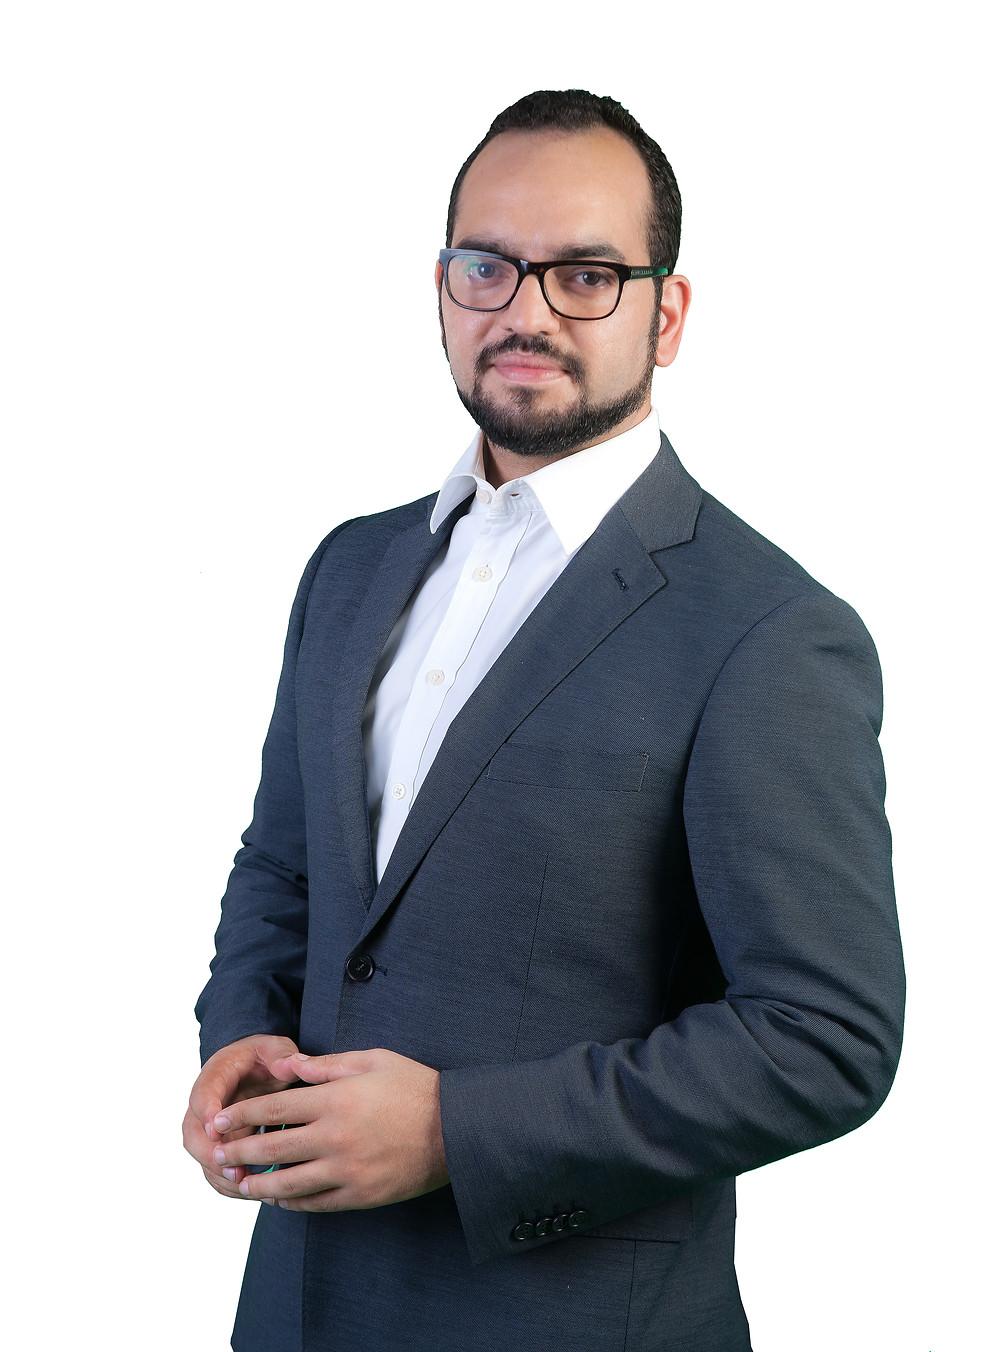 Lic. Gilberto Objio Subero, abogado experto en derecho medico